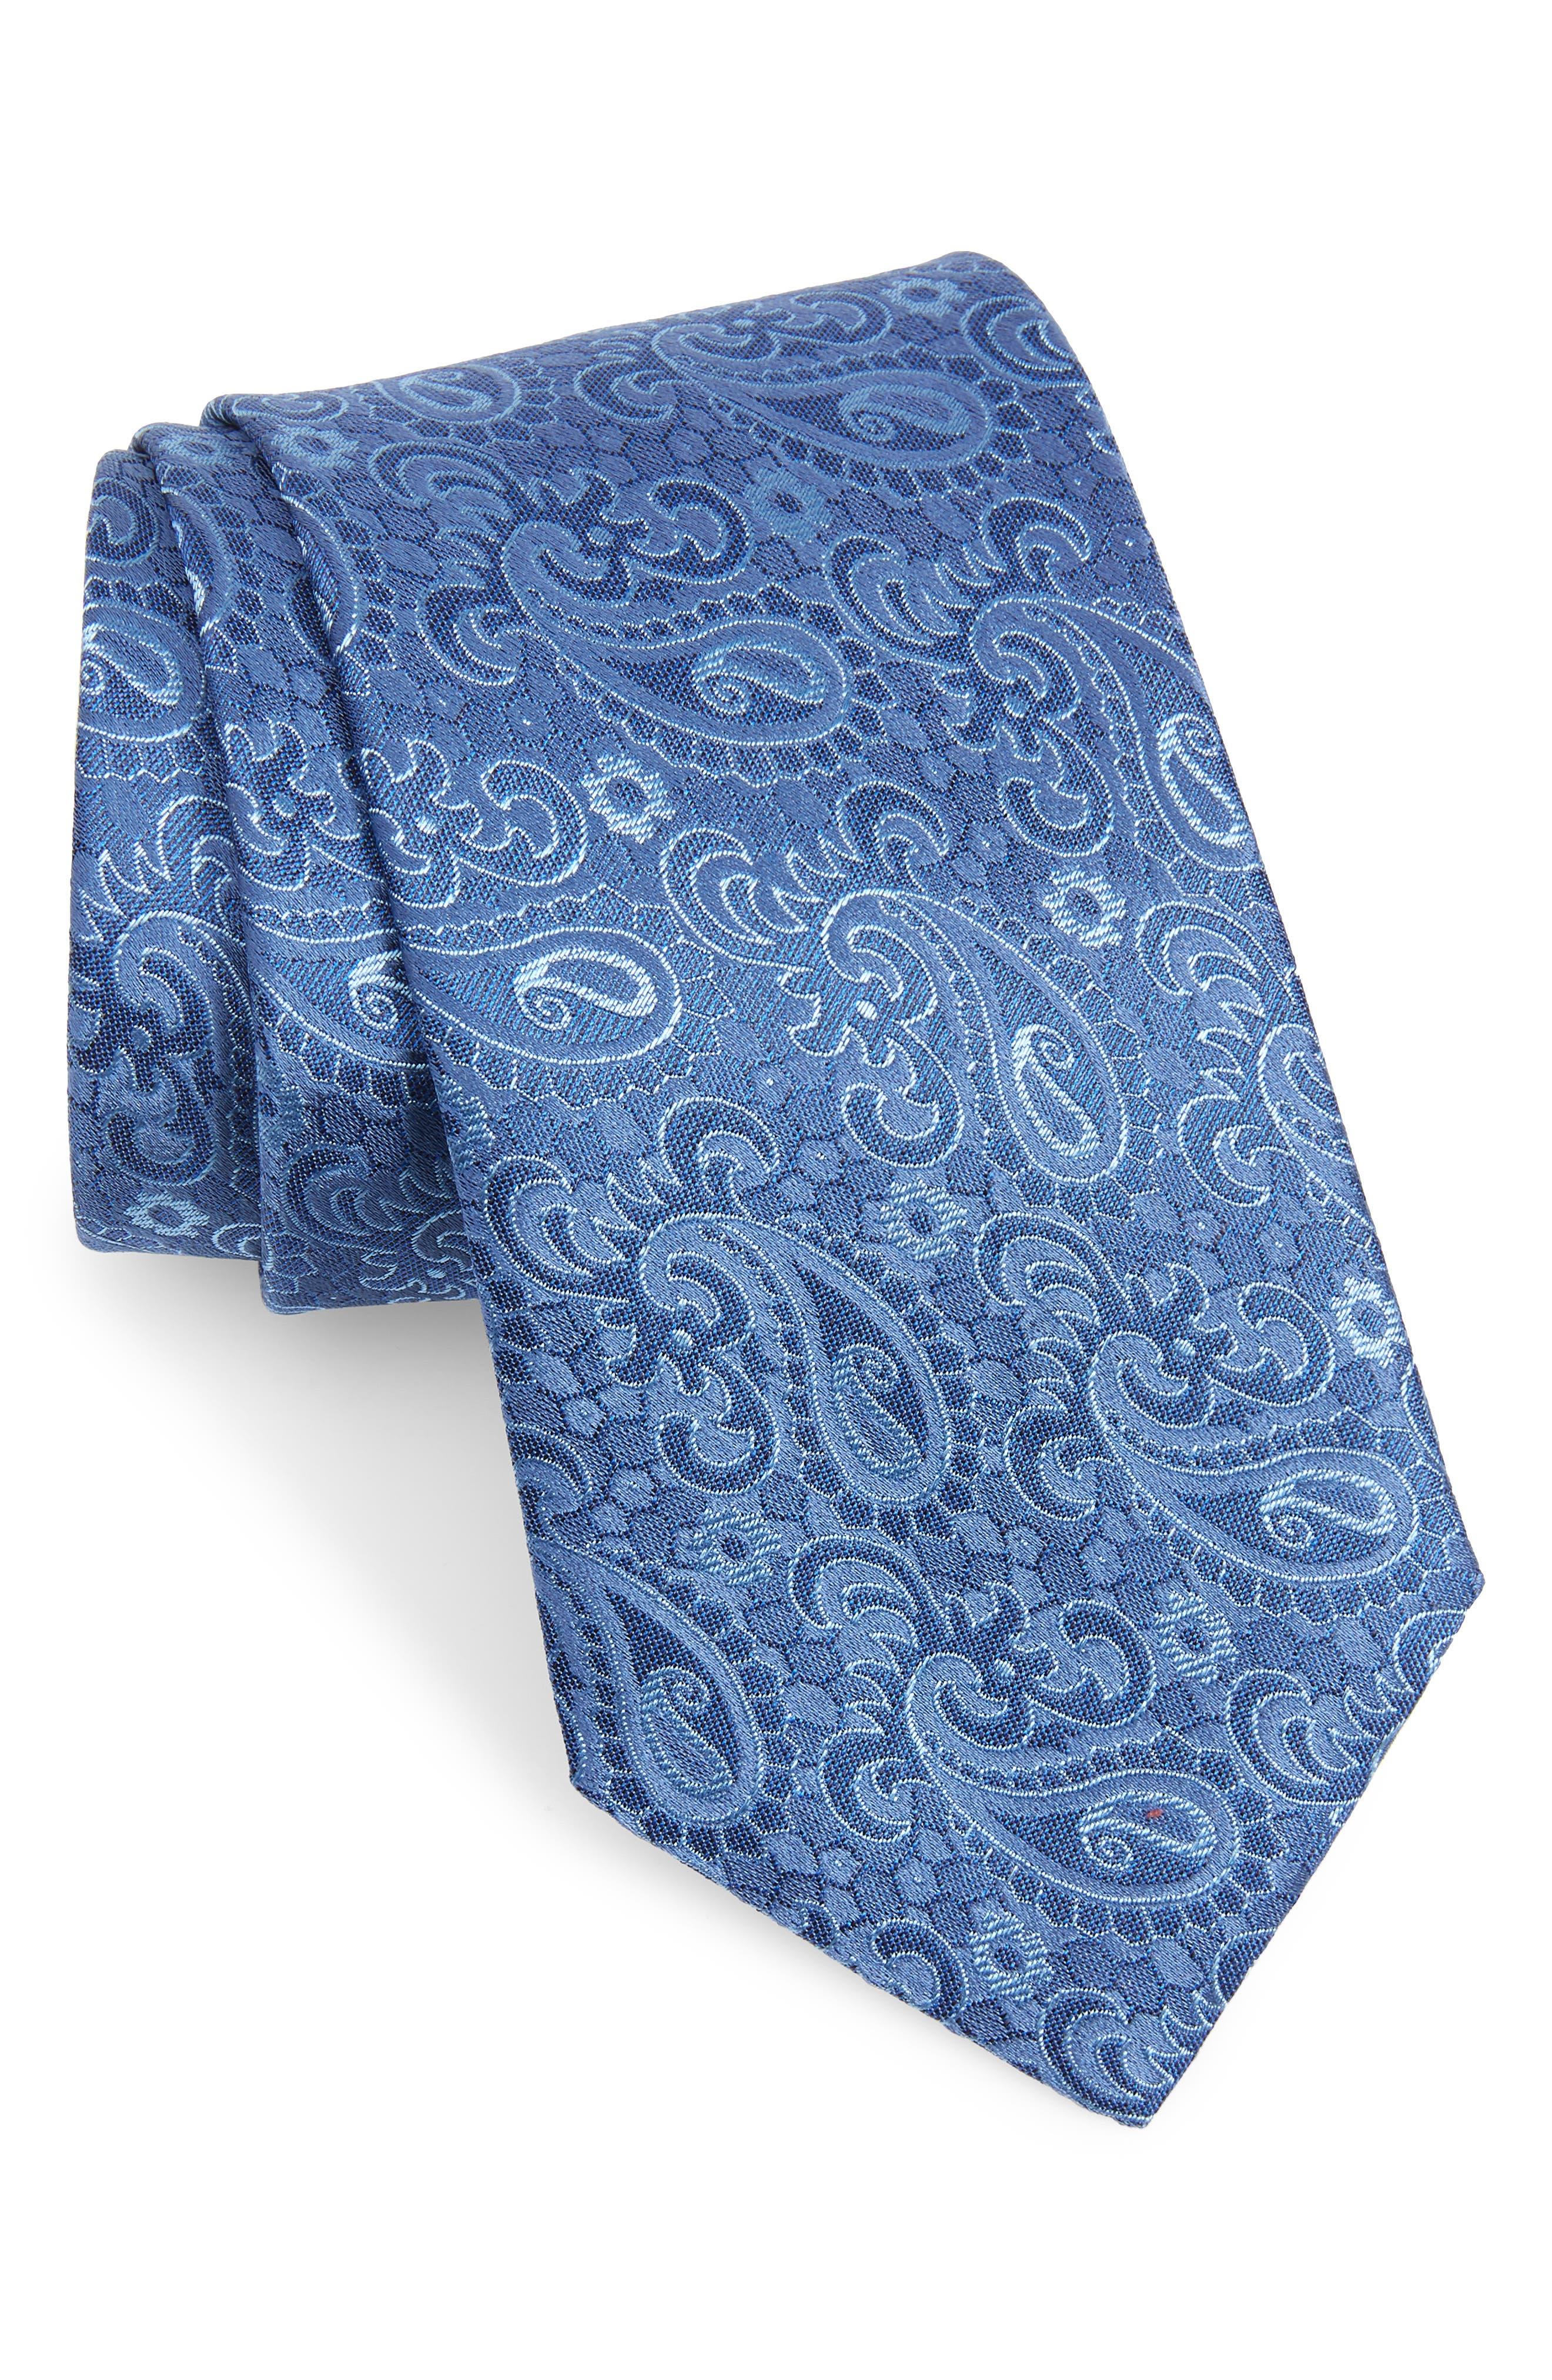 DAVID DONAHUE, Paisley Silk Tie, Main thumbnail 1, color, BLUE